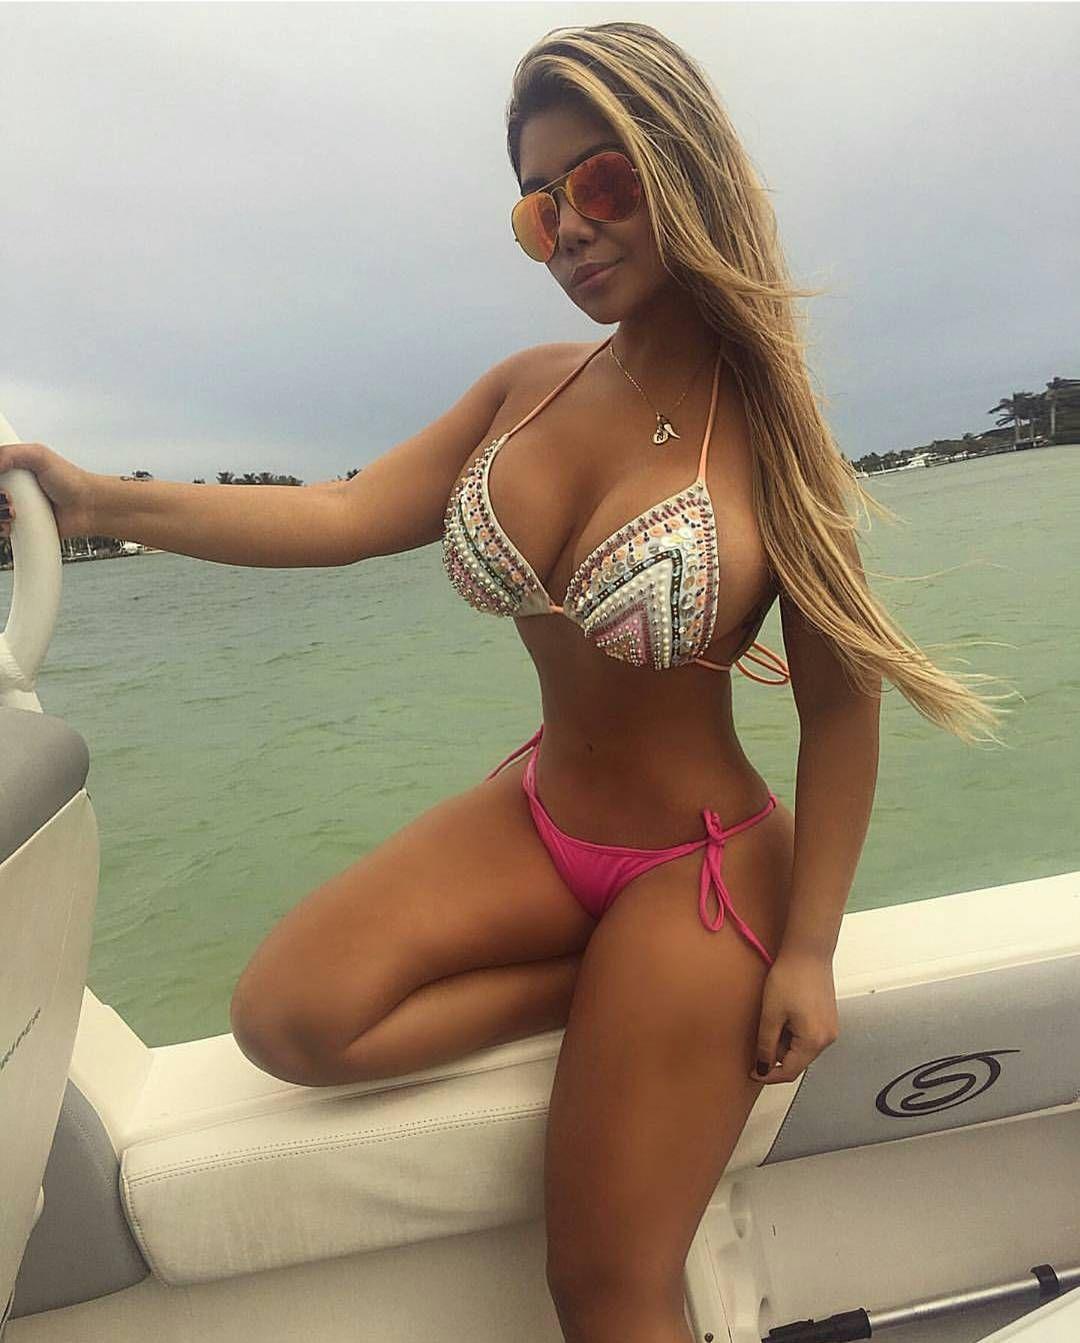 latina bikini babes